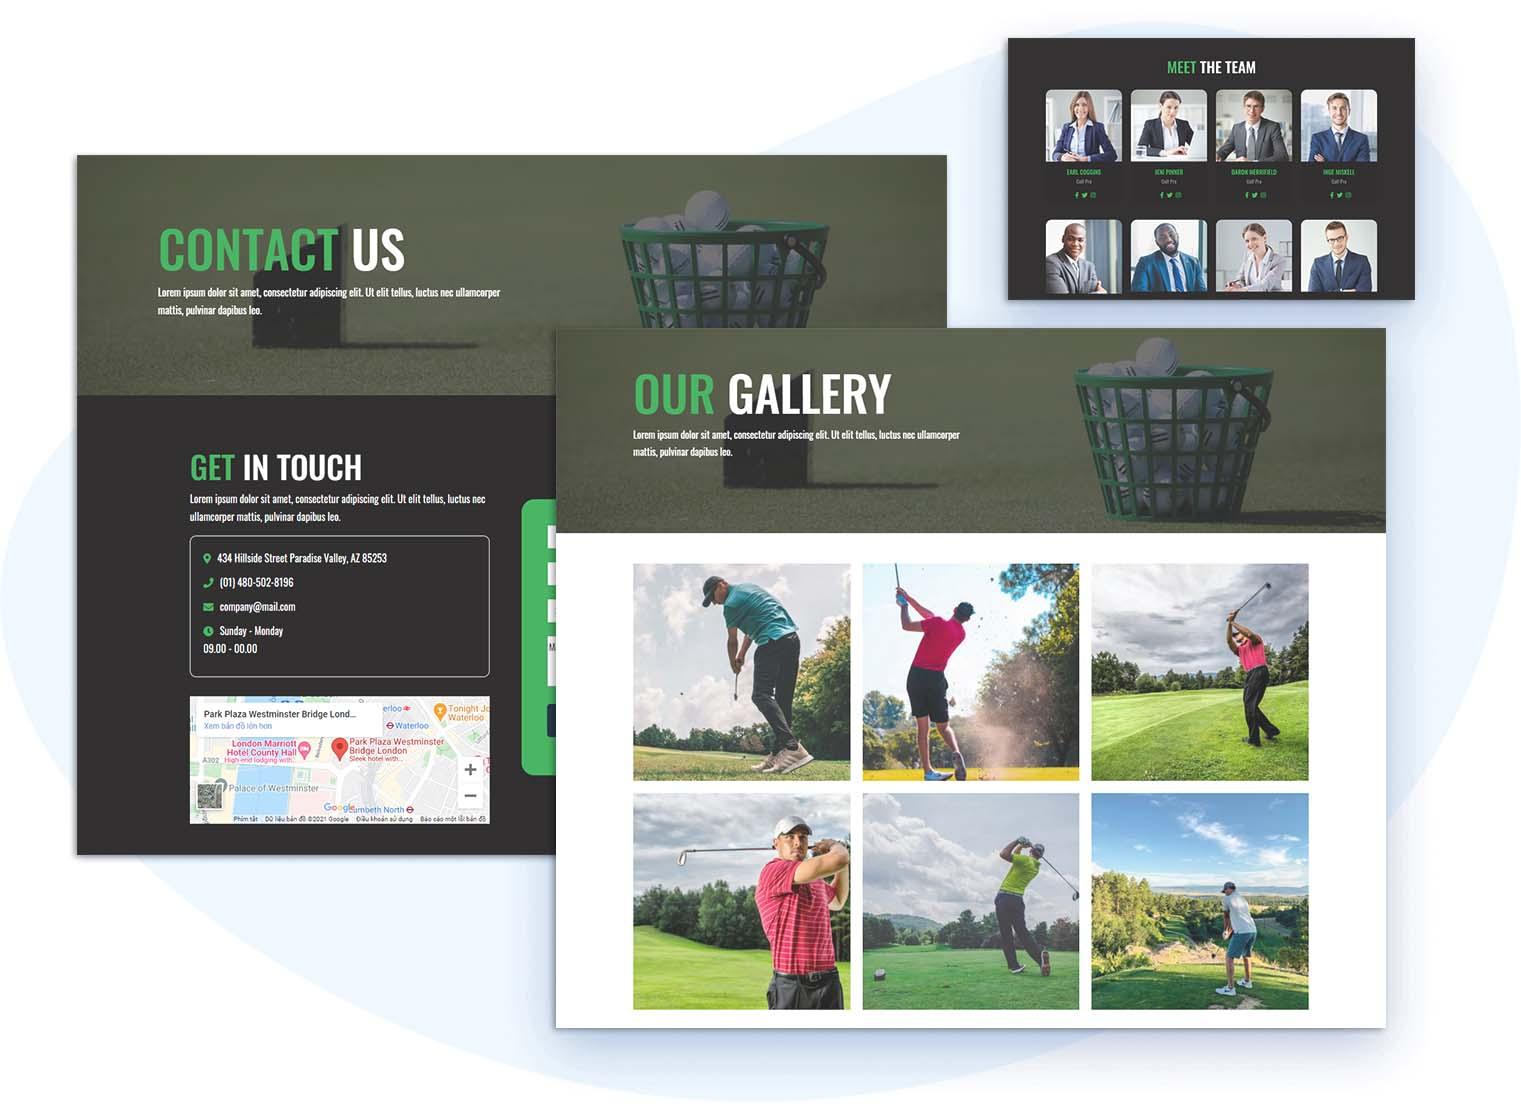 lt-golf-free-responsive-joomla-template-contact